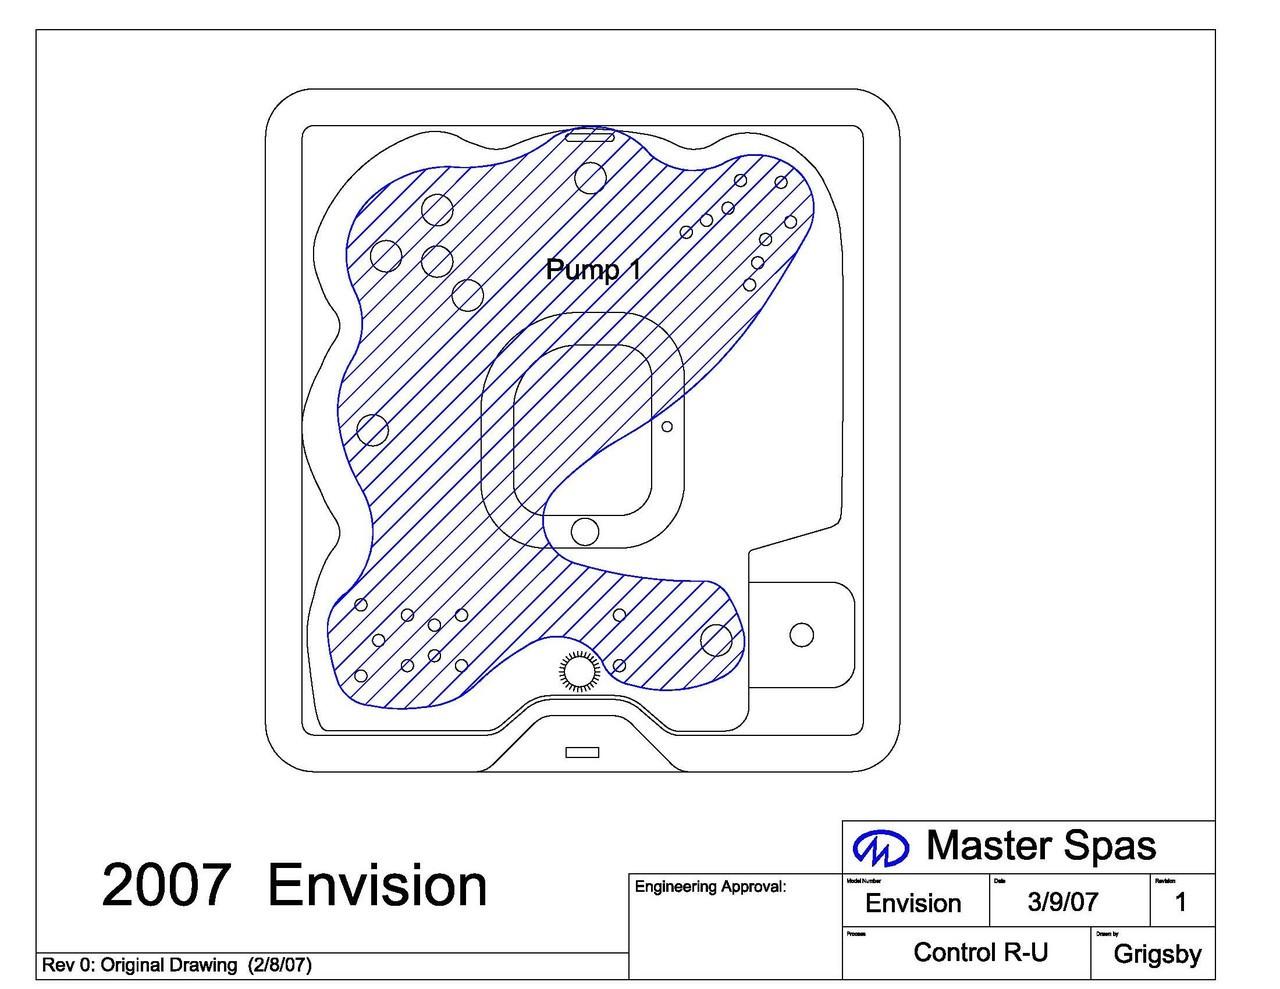 Master Spa - 2007 Envision Spa Diagram